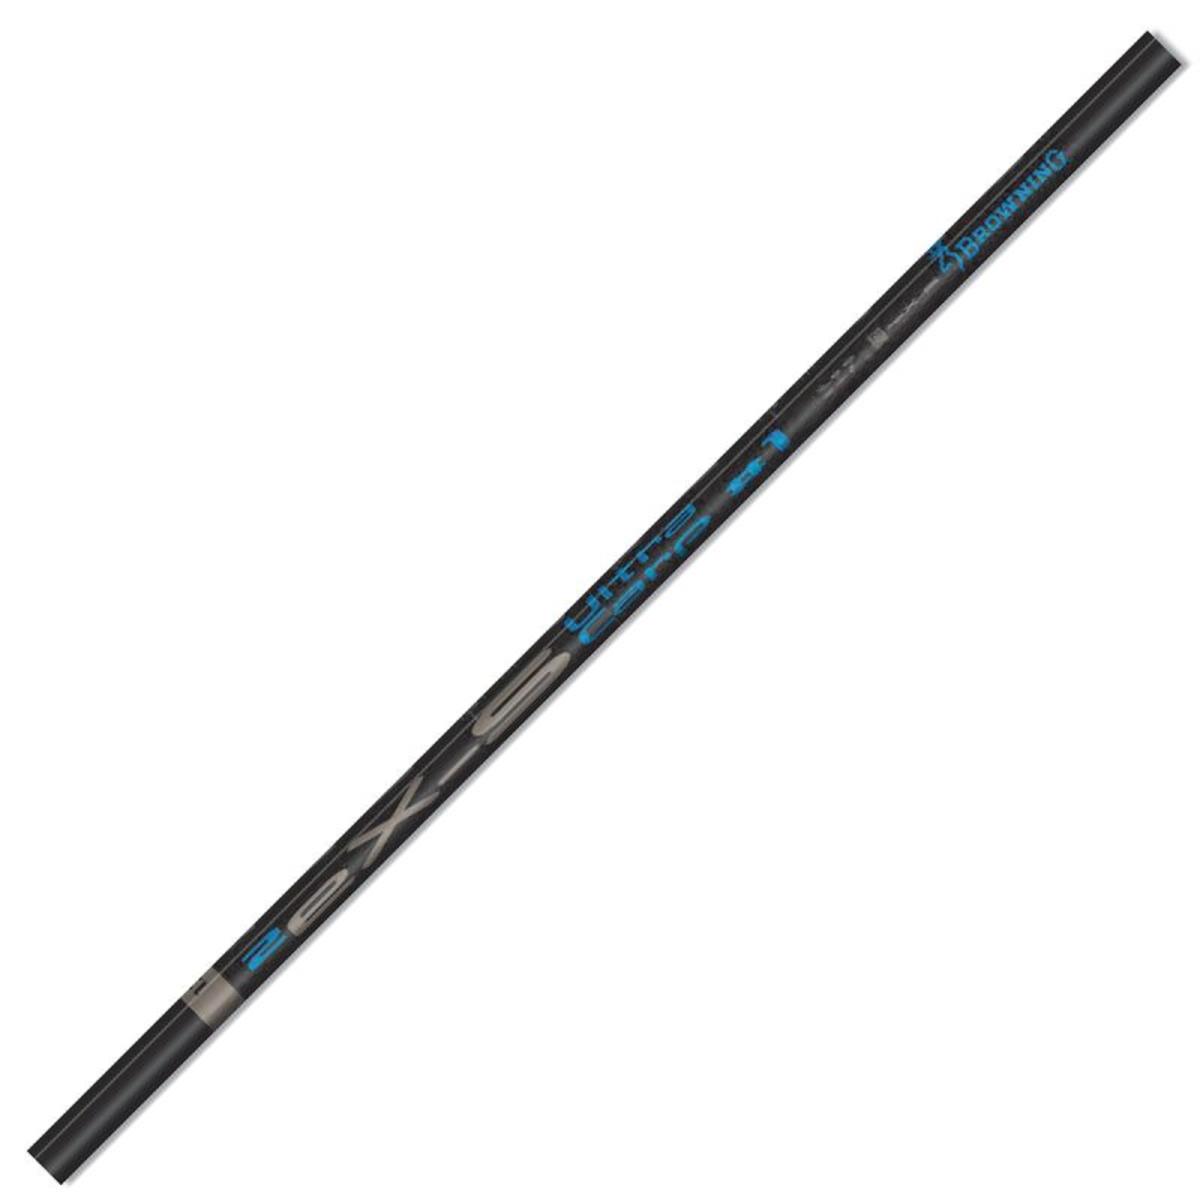 Browning 2 eX - S Ultra Carp - Pole - 13 m